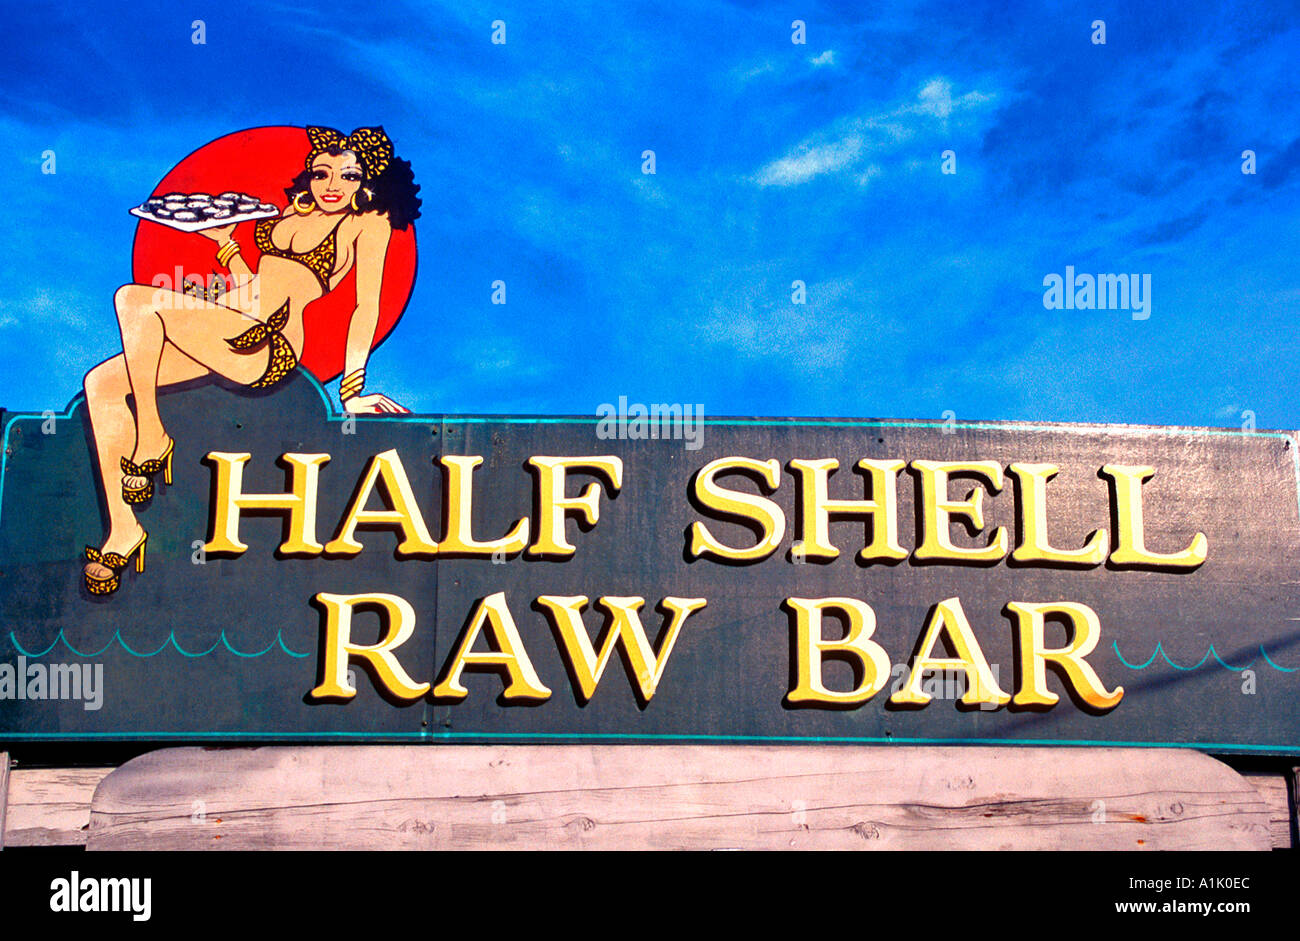 Half Shell Raw Bar Waterfront Seafood Restaurant Key West